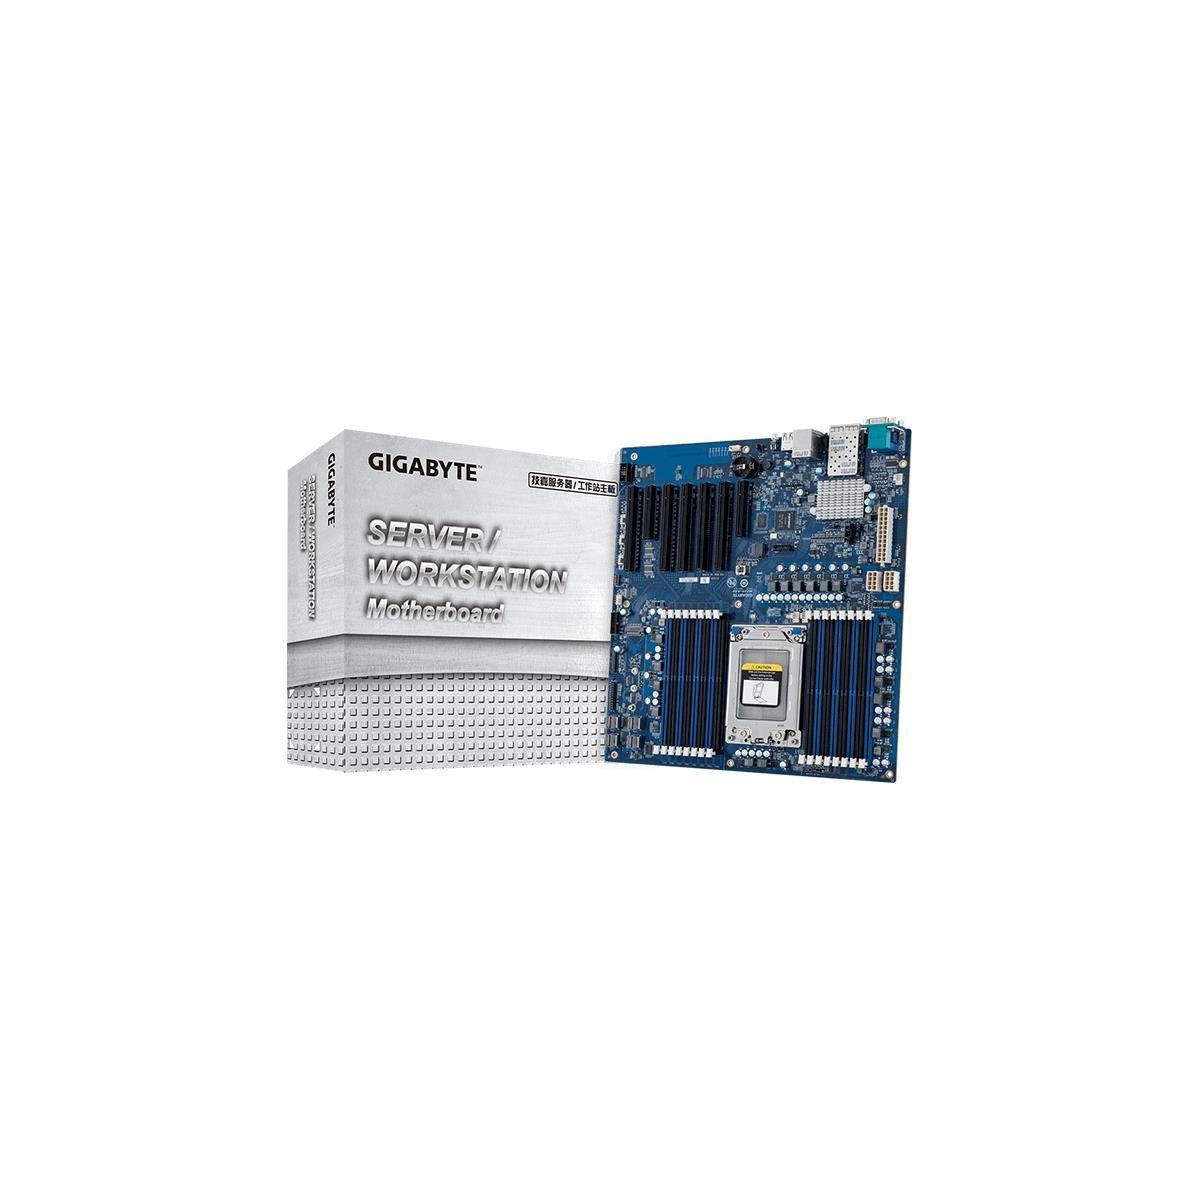 Gigabyte MZ31 AMD EPYC 7000 Motherboard Rocks 16 DIMM Slots, Tons Of